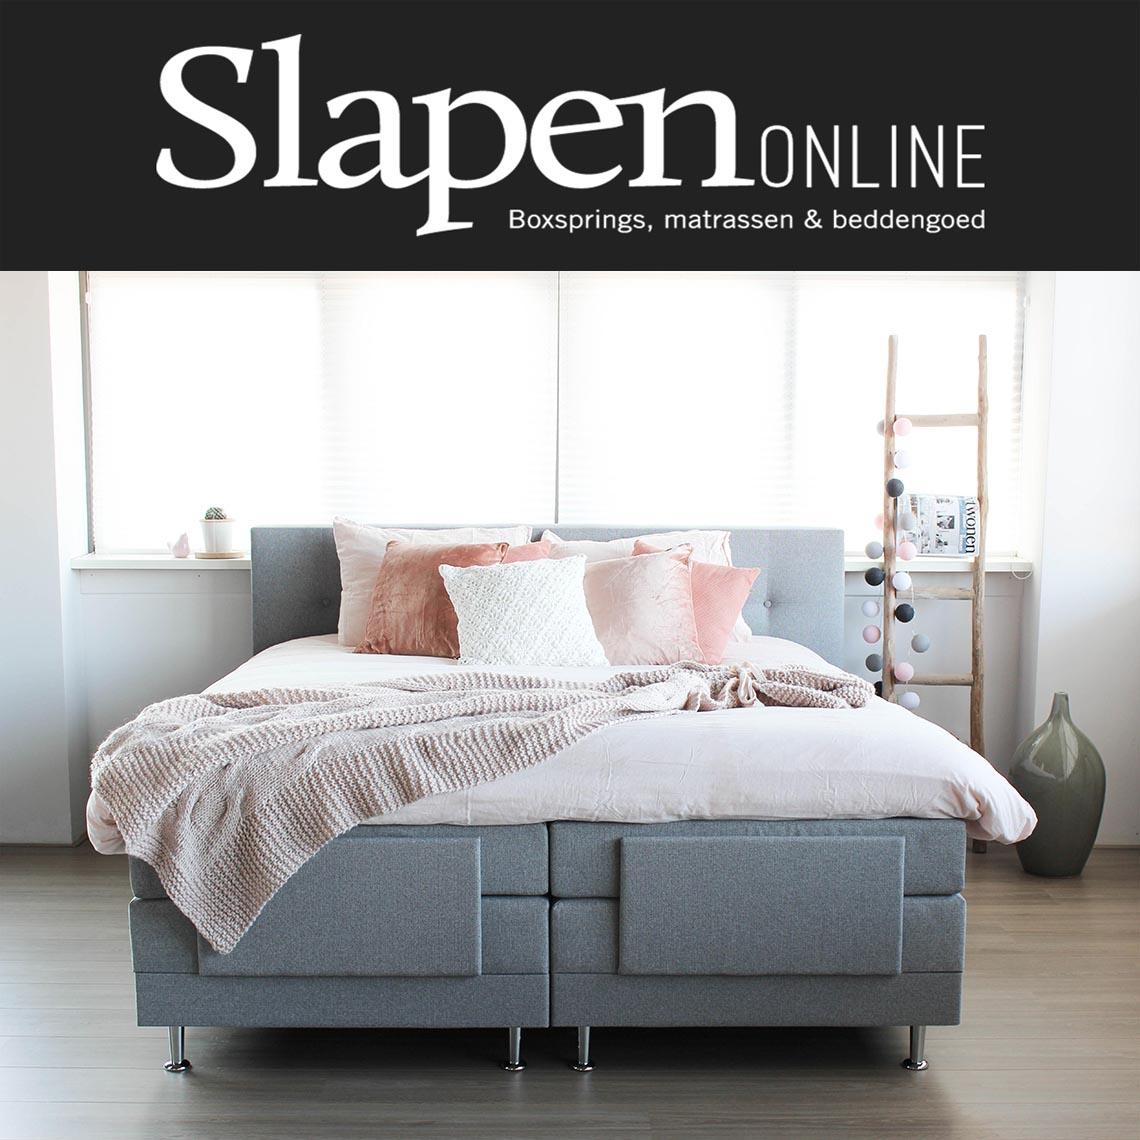 goedkope complete boxspring 140x200 slapen online. Black Bedroom Furniture Sets. Home Design Ideas